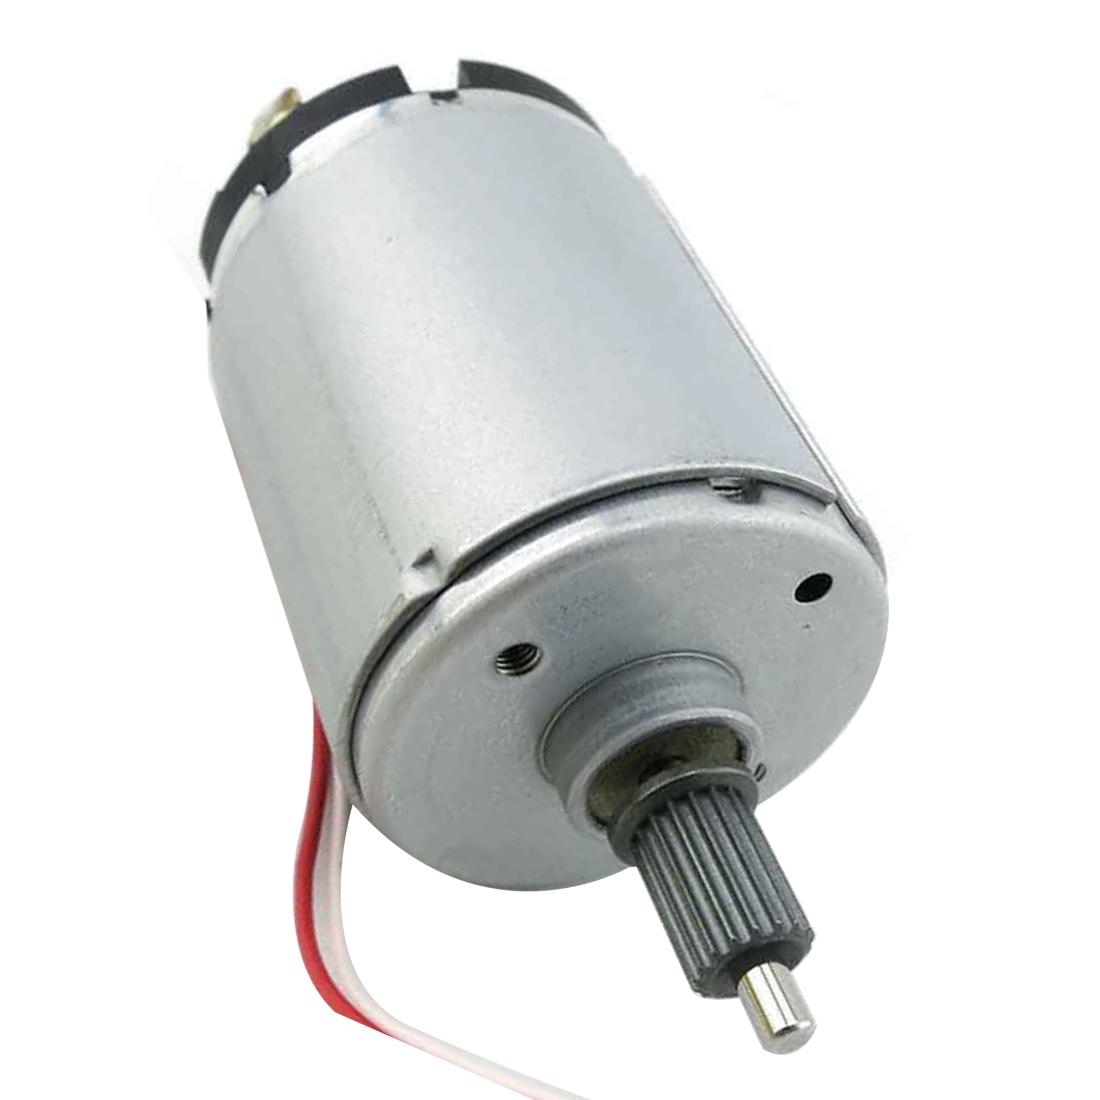 How To Build Mini High Voltage Generator